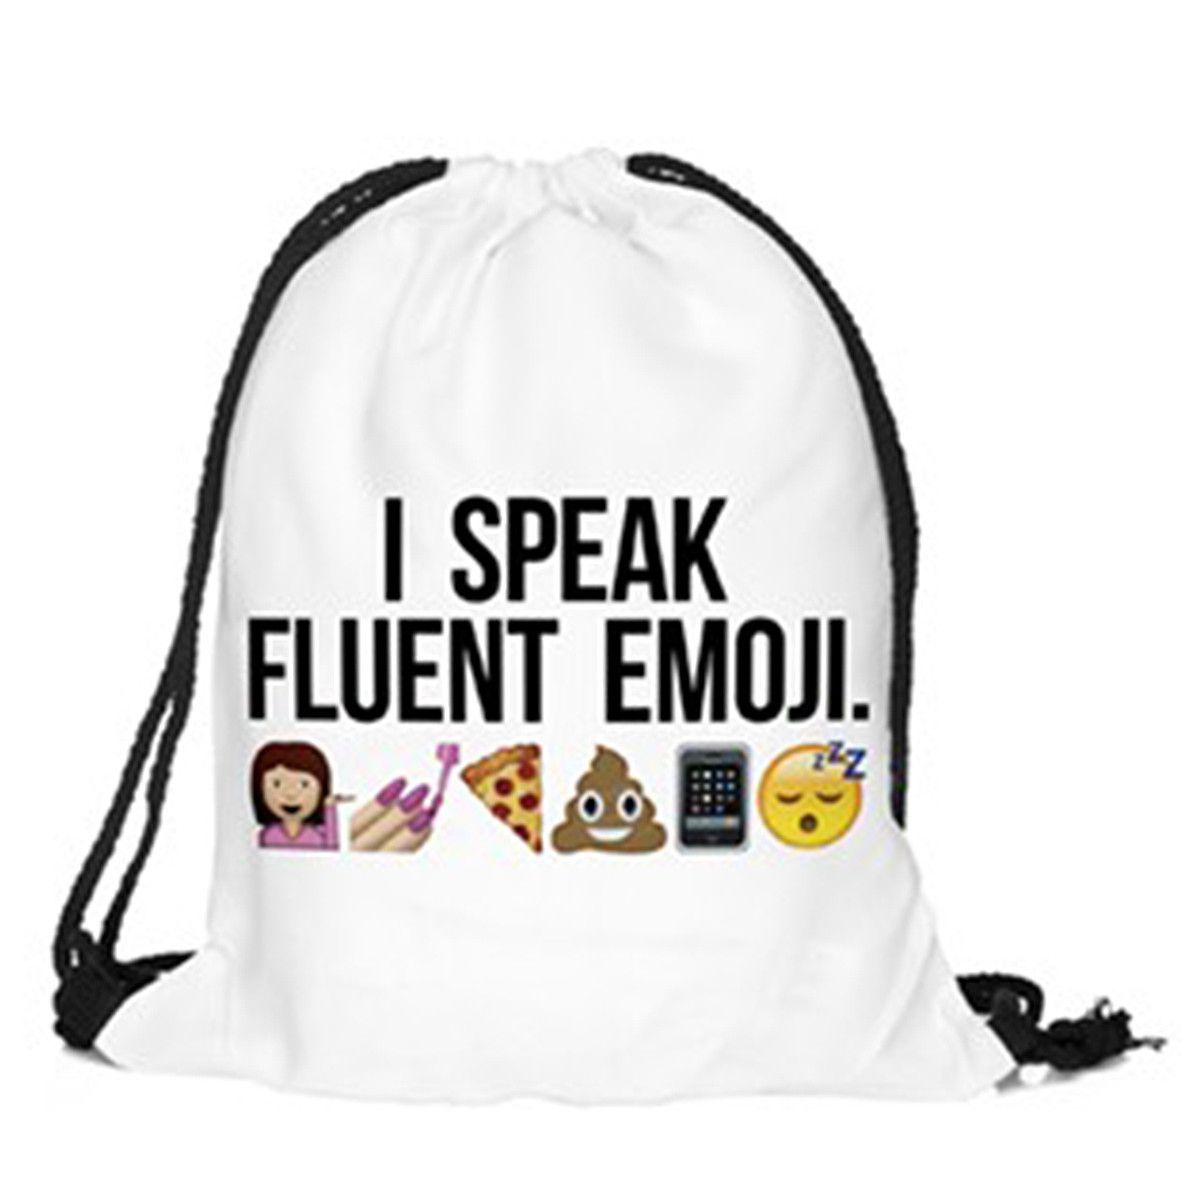 If you re fluent in emoji bfb4a2fdd31d3